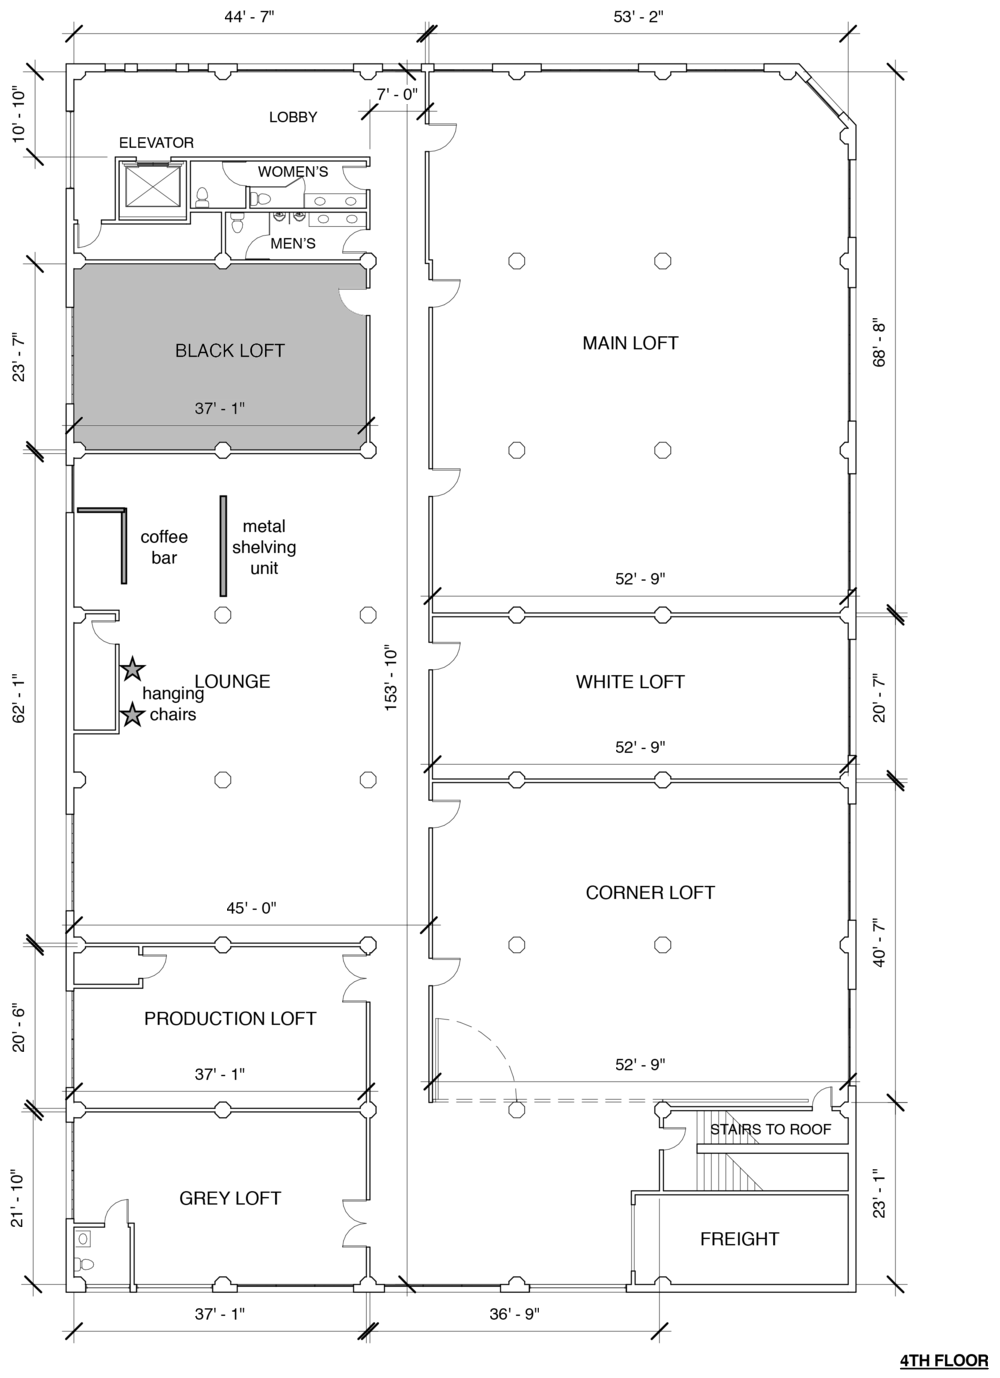 4thFloor_Schematic_HL-shelving copyBL.png